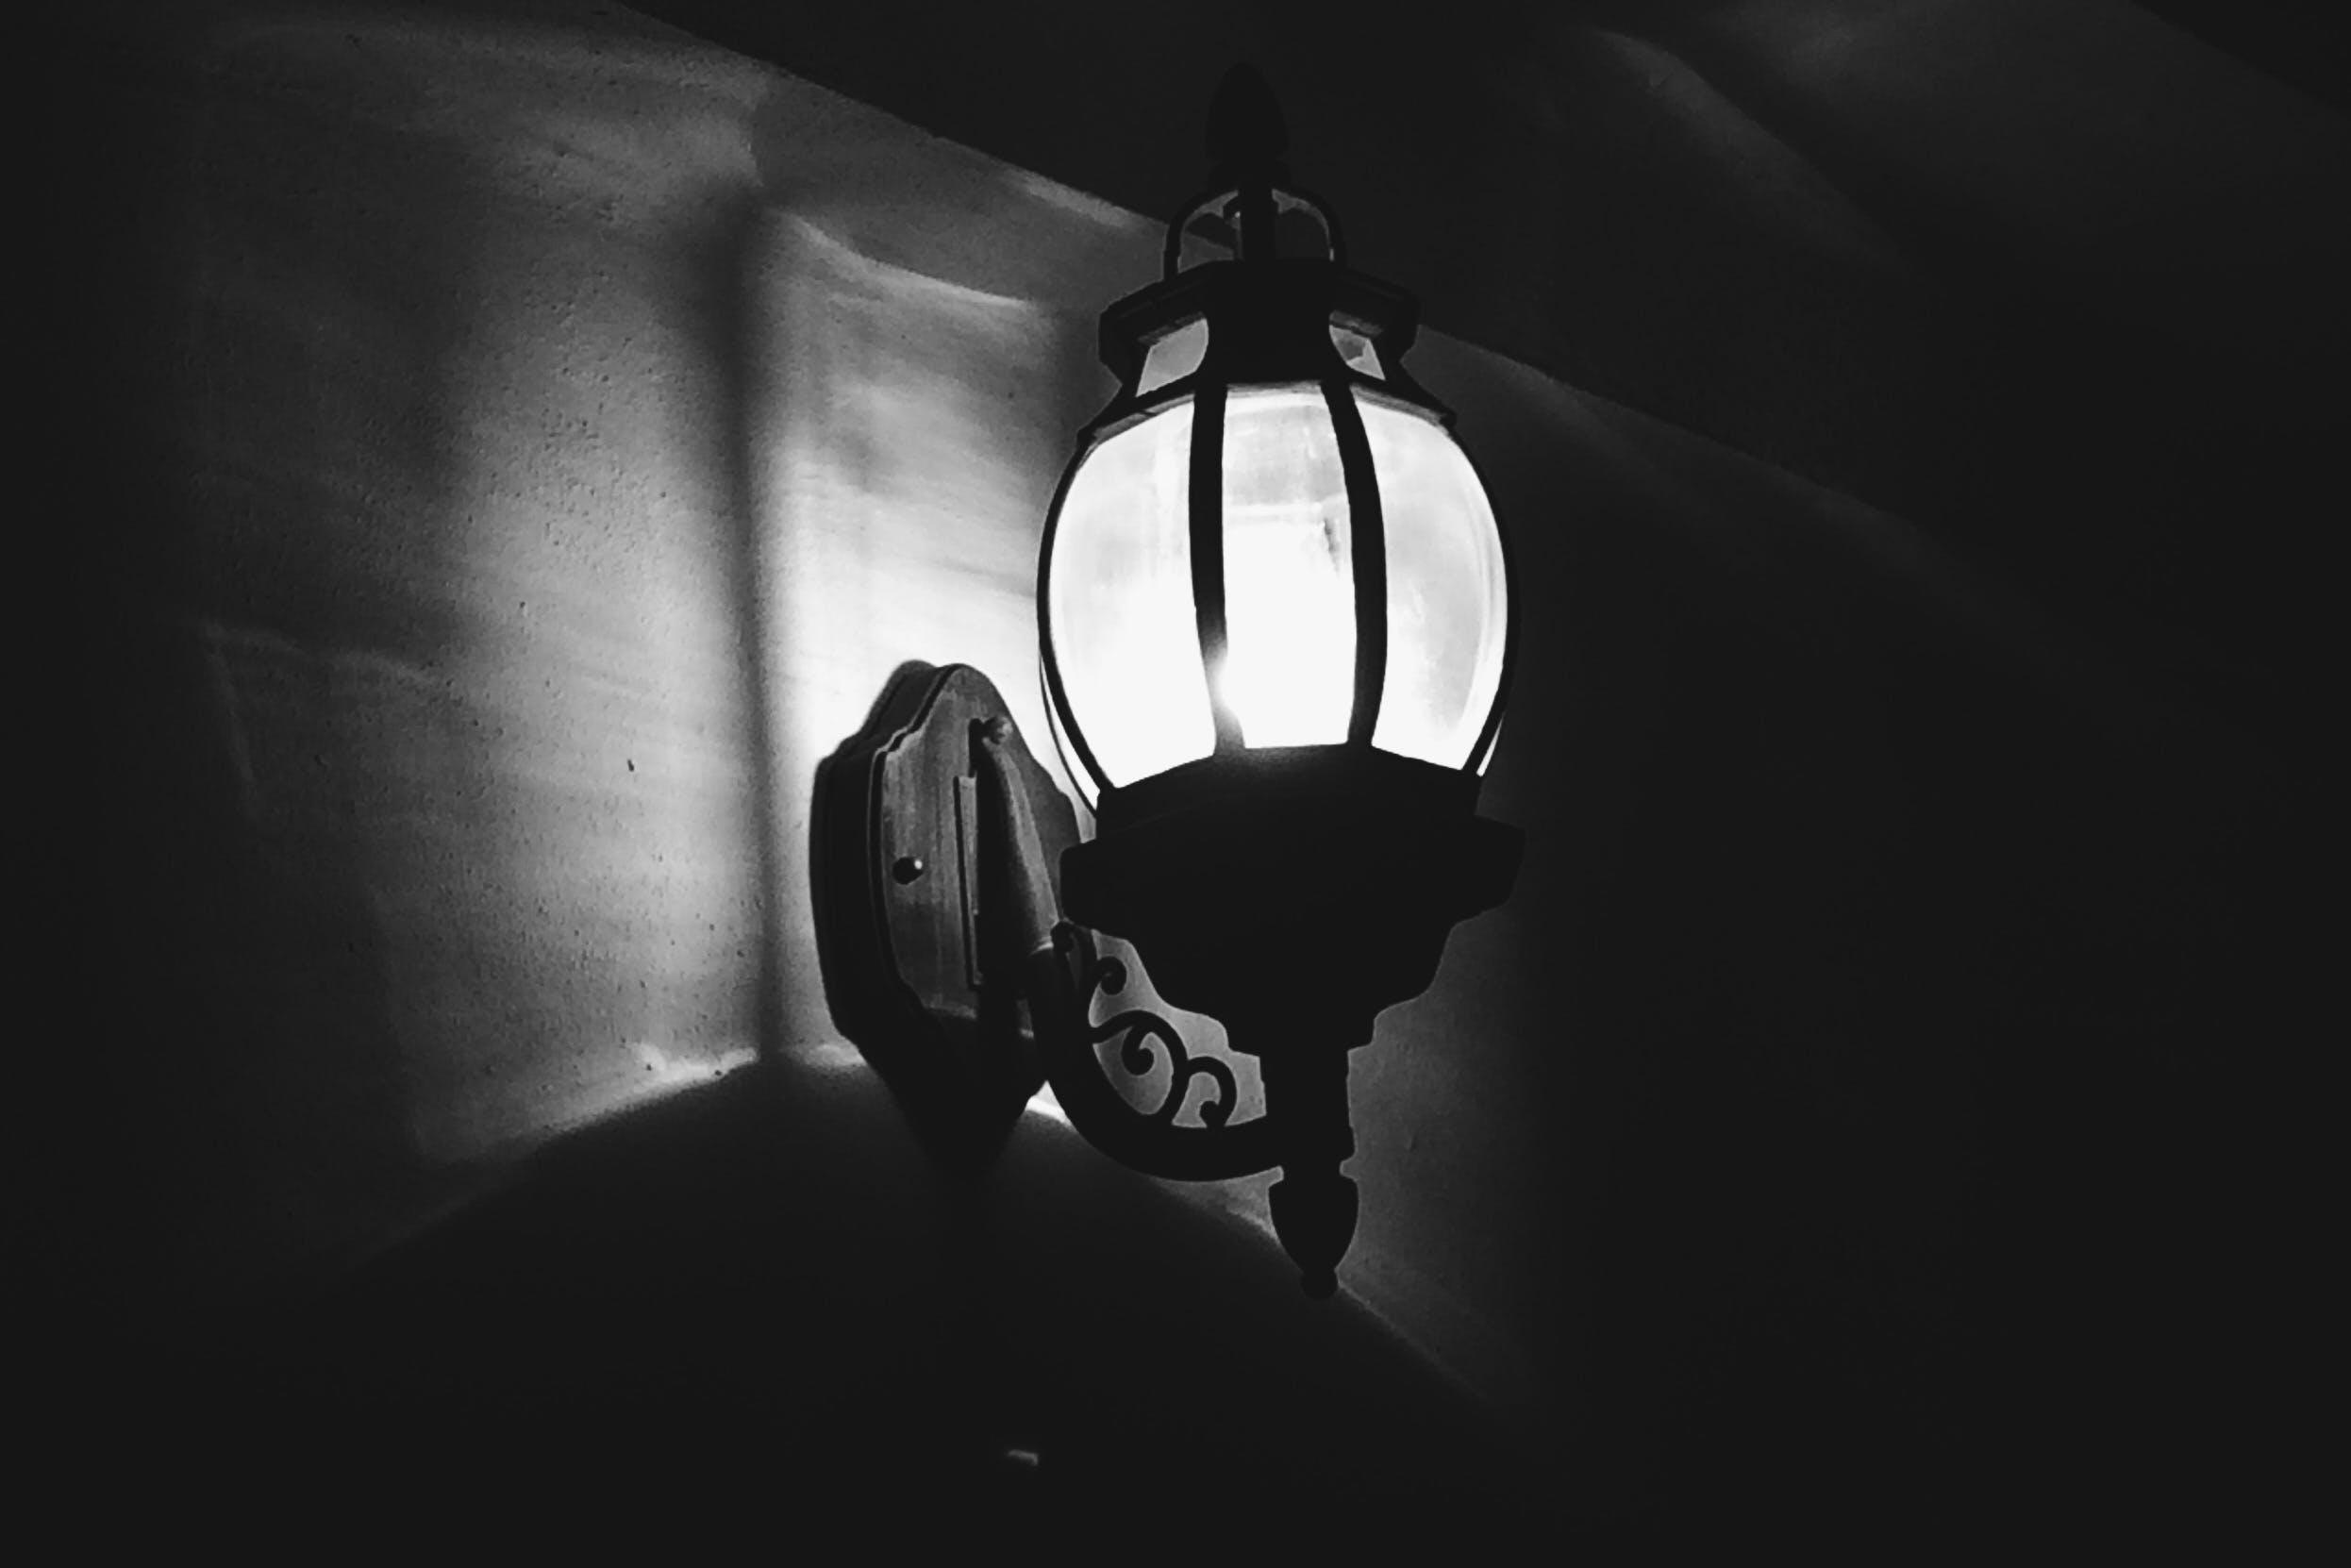 backlit, black and white, bulb